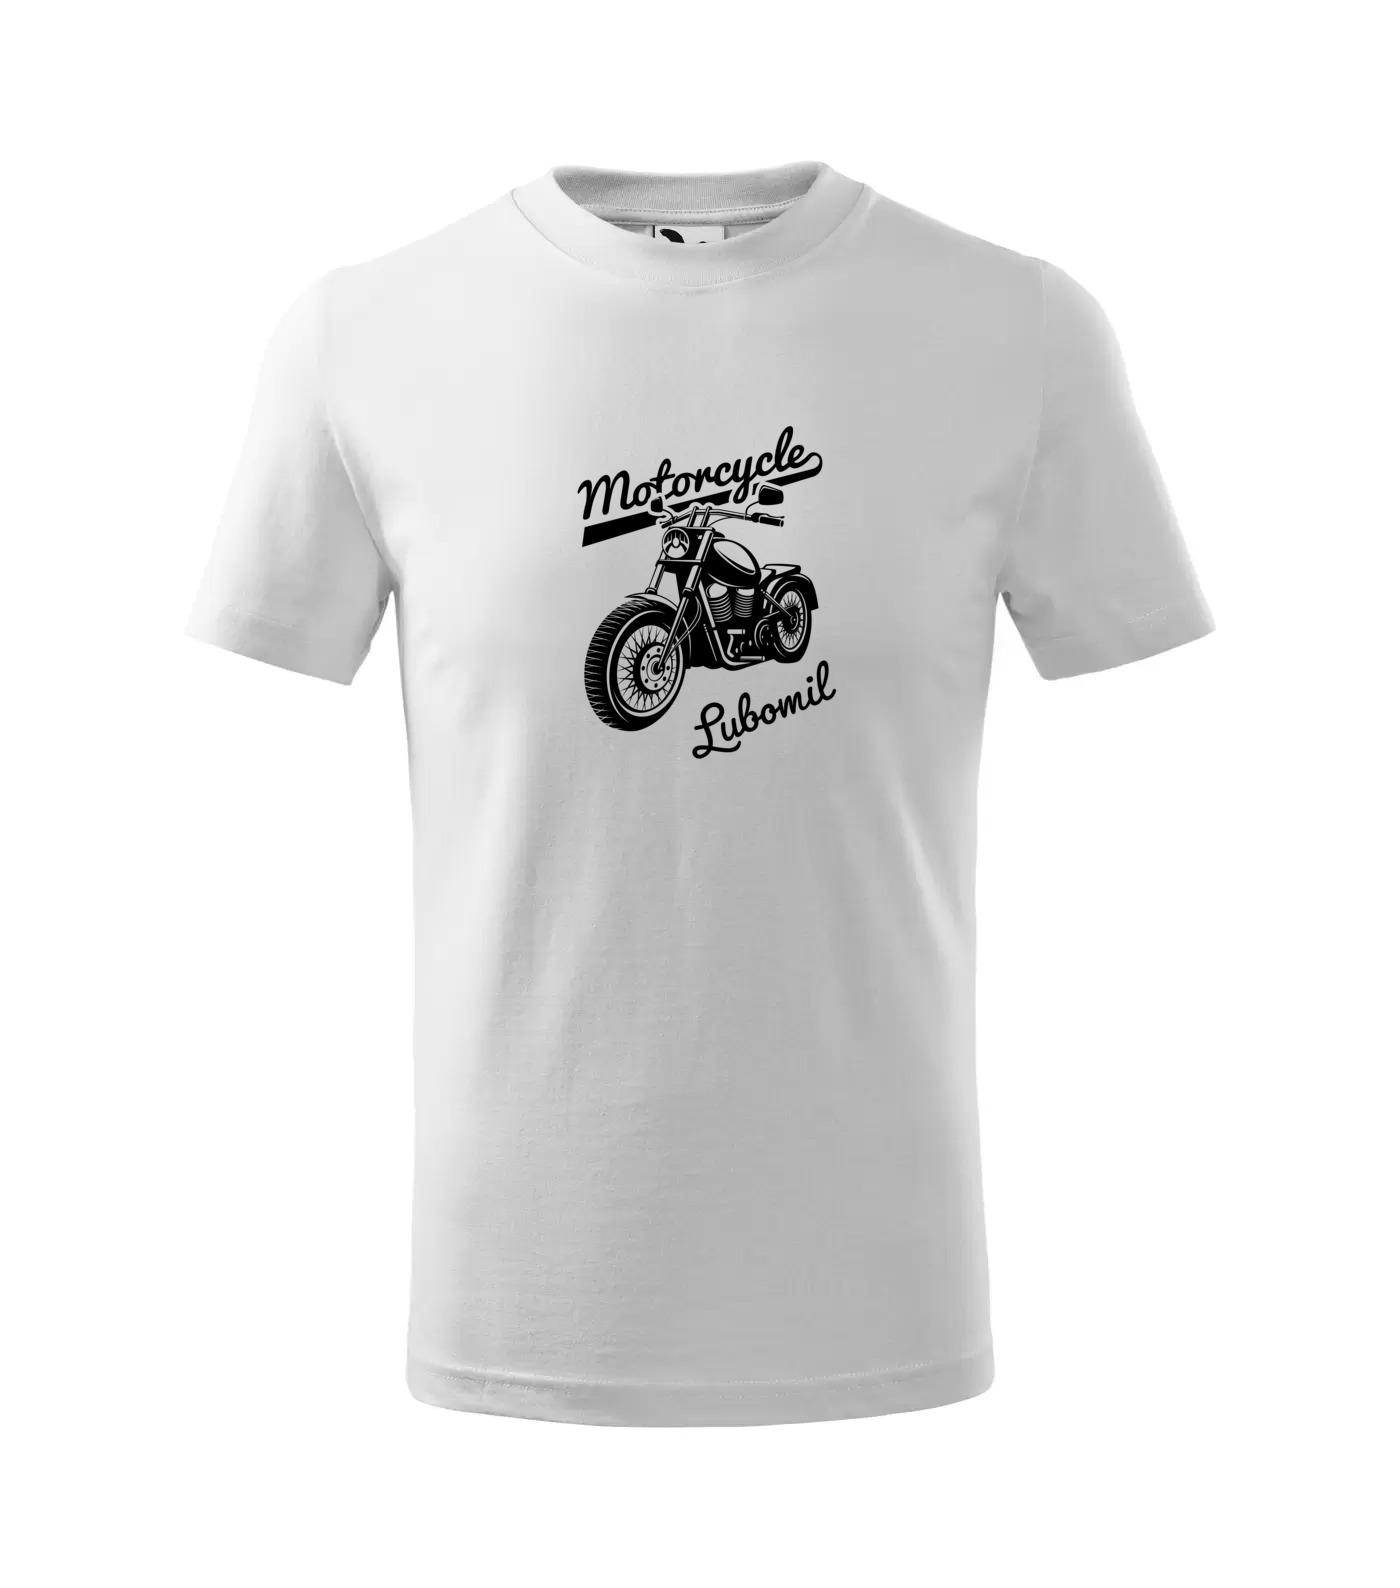 Tričko Motorkář Inverse Lubomil